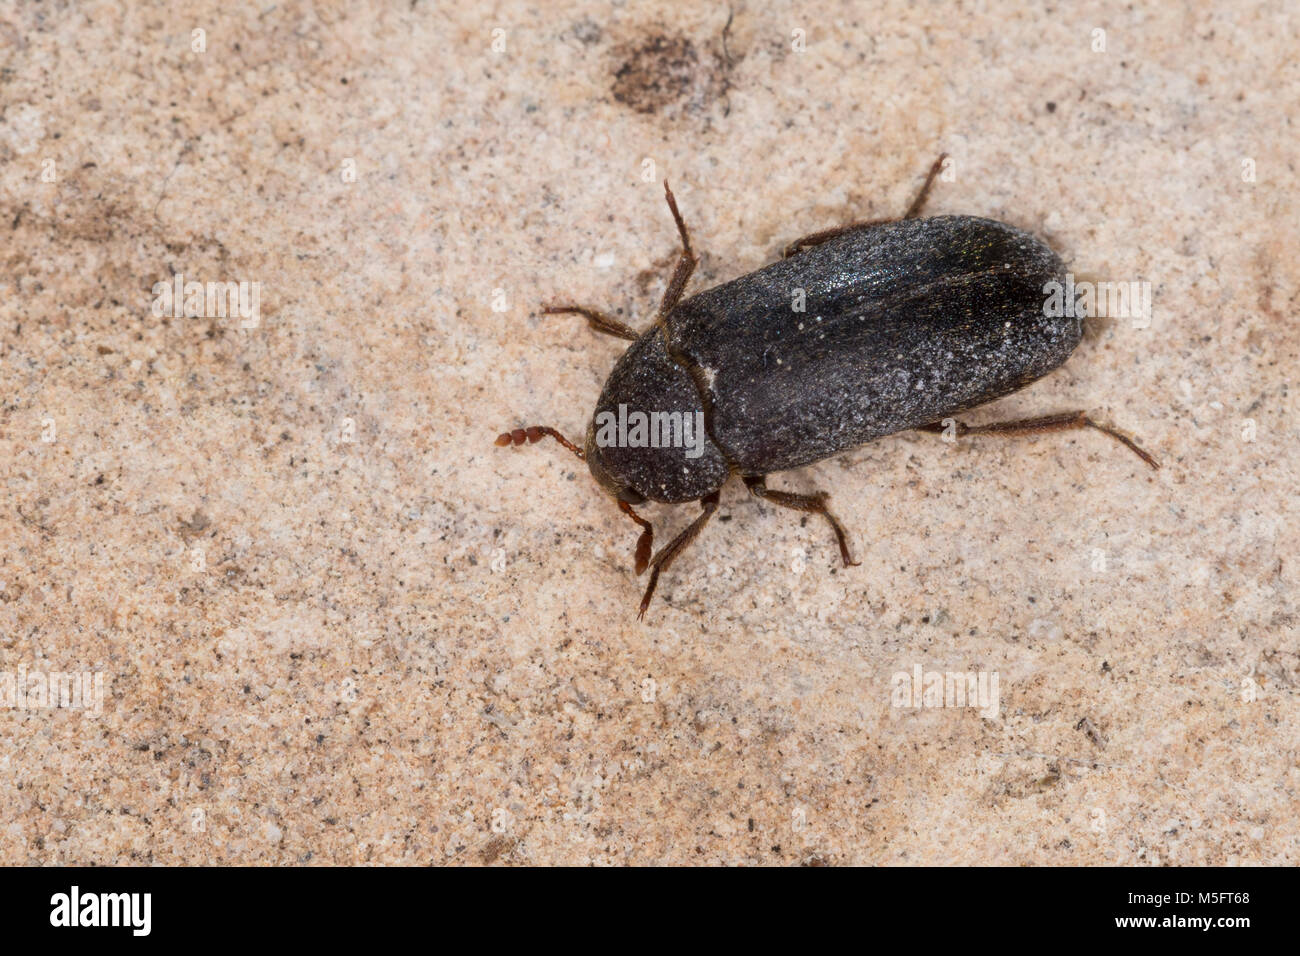 Coleoptera Dermestidae Stock Photos Amp Coleoptera